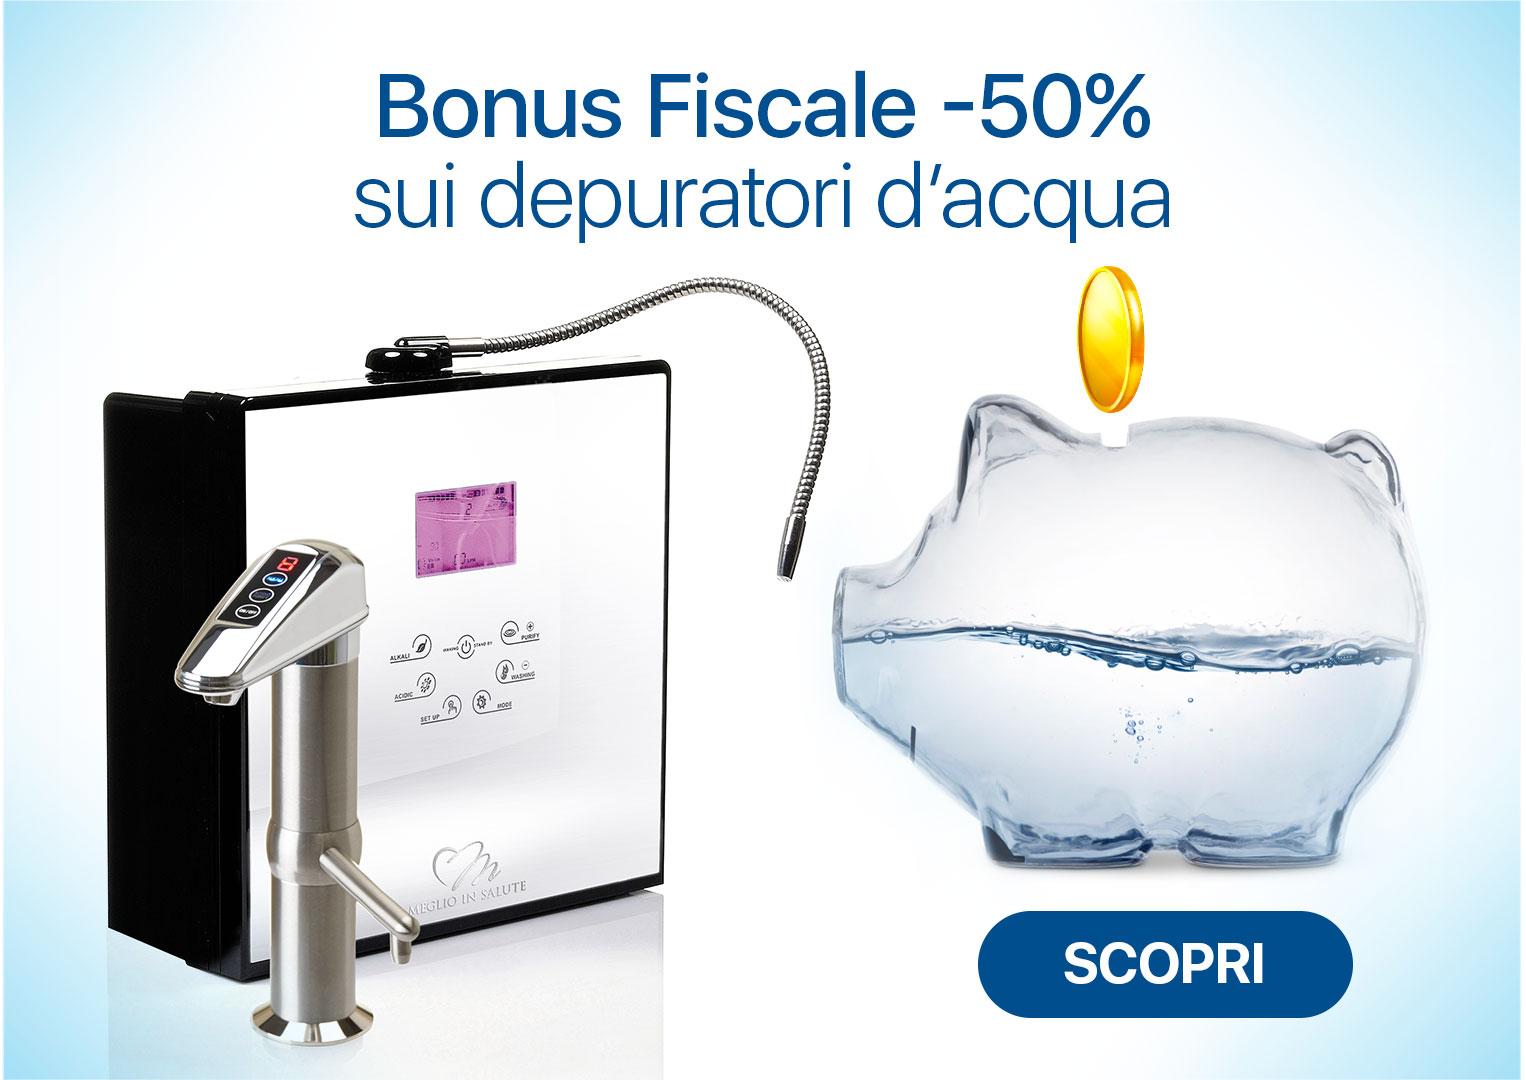 depuratori-bonus-fiscale-banner-hp-mis